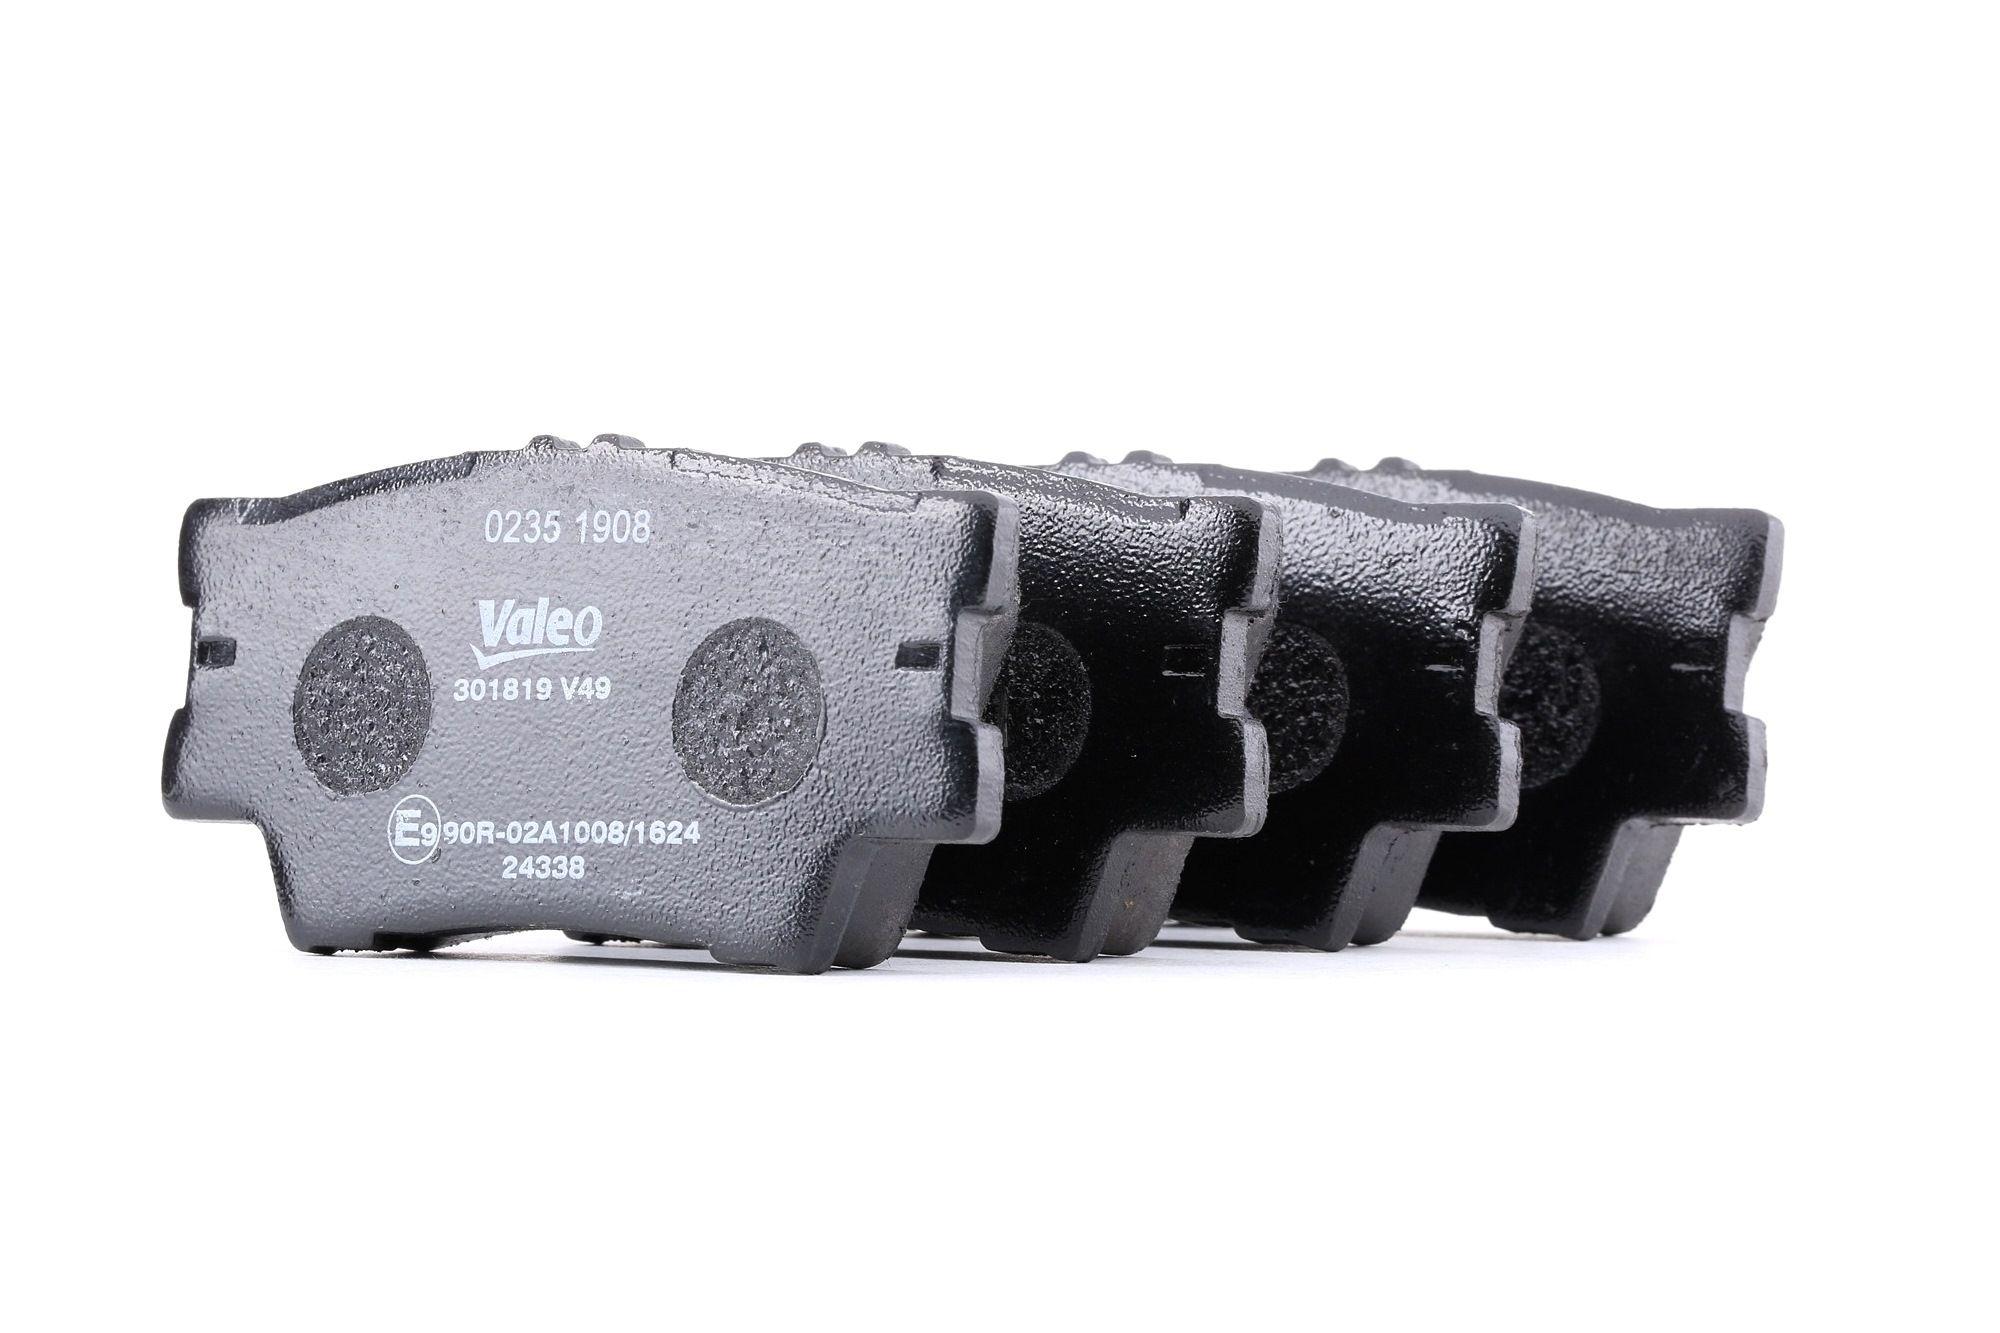 LEXUS LFA 2011 Bremsbelagsatz - Original VALEO 301819 Höhe: 49,1mm, Breite: 96,9mm, Dicke/Stärke: 15,9mm